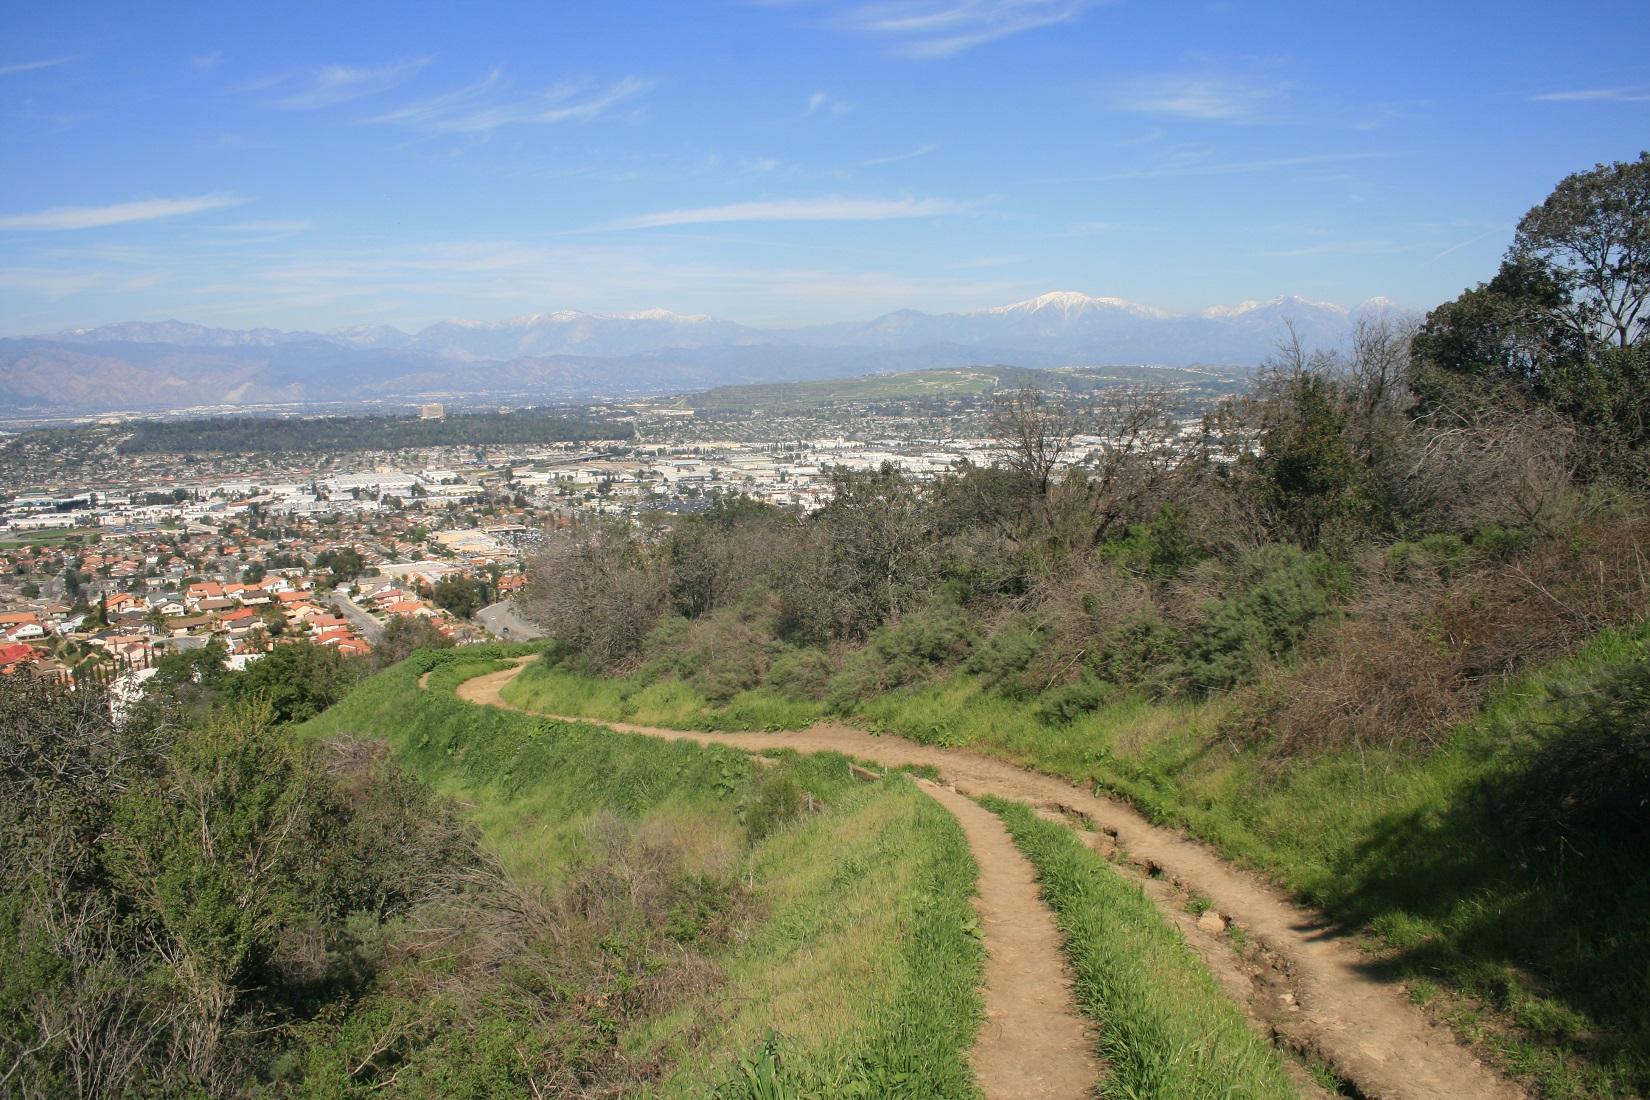 Schabarum Trail, Los Angeles County, CA